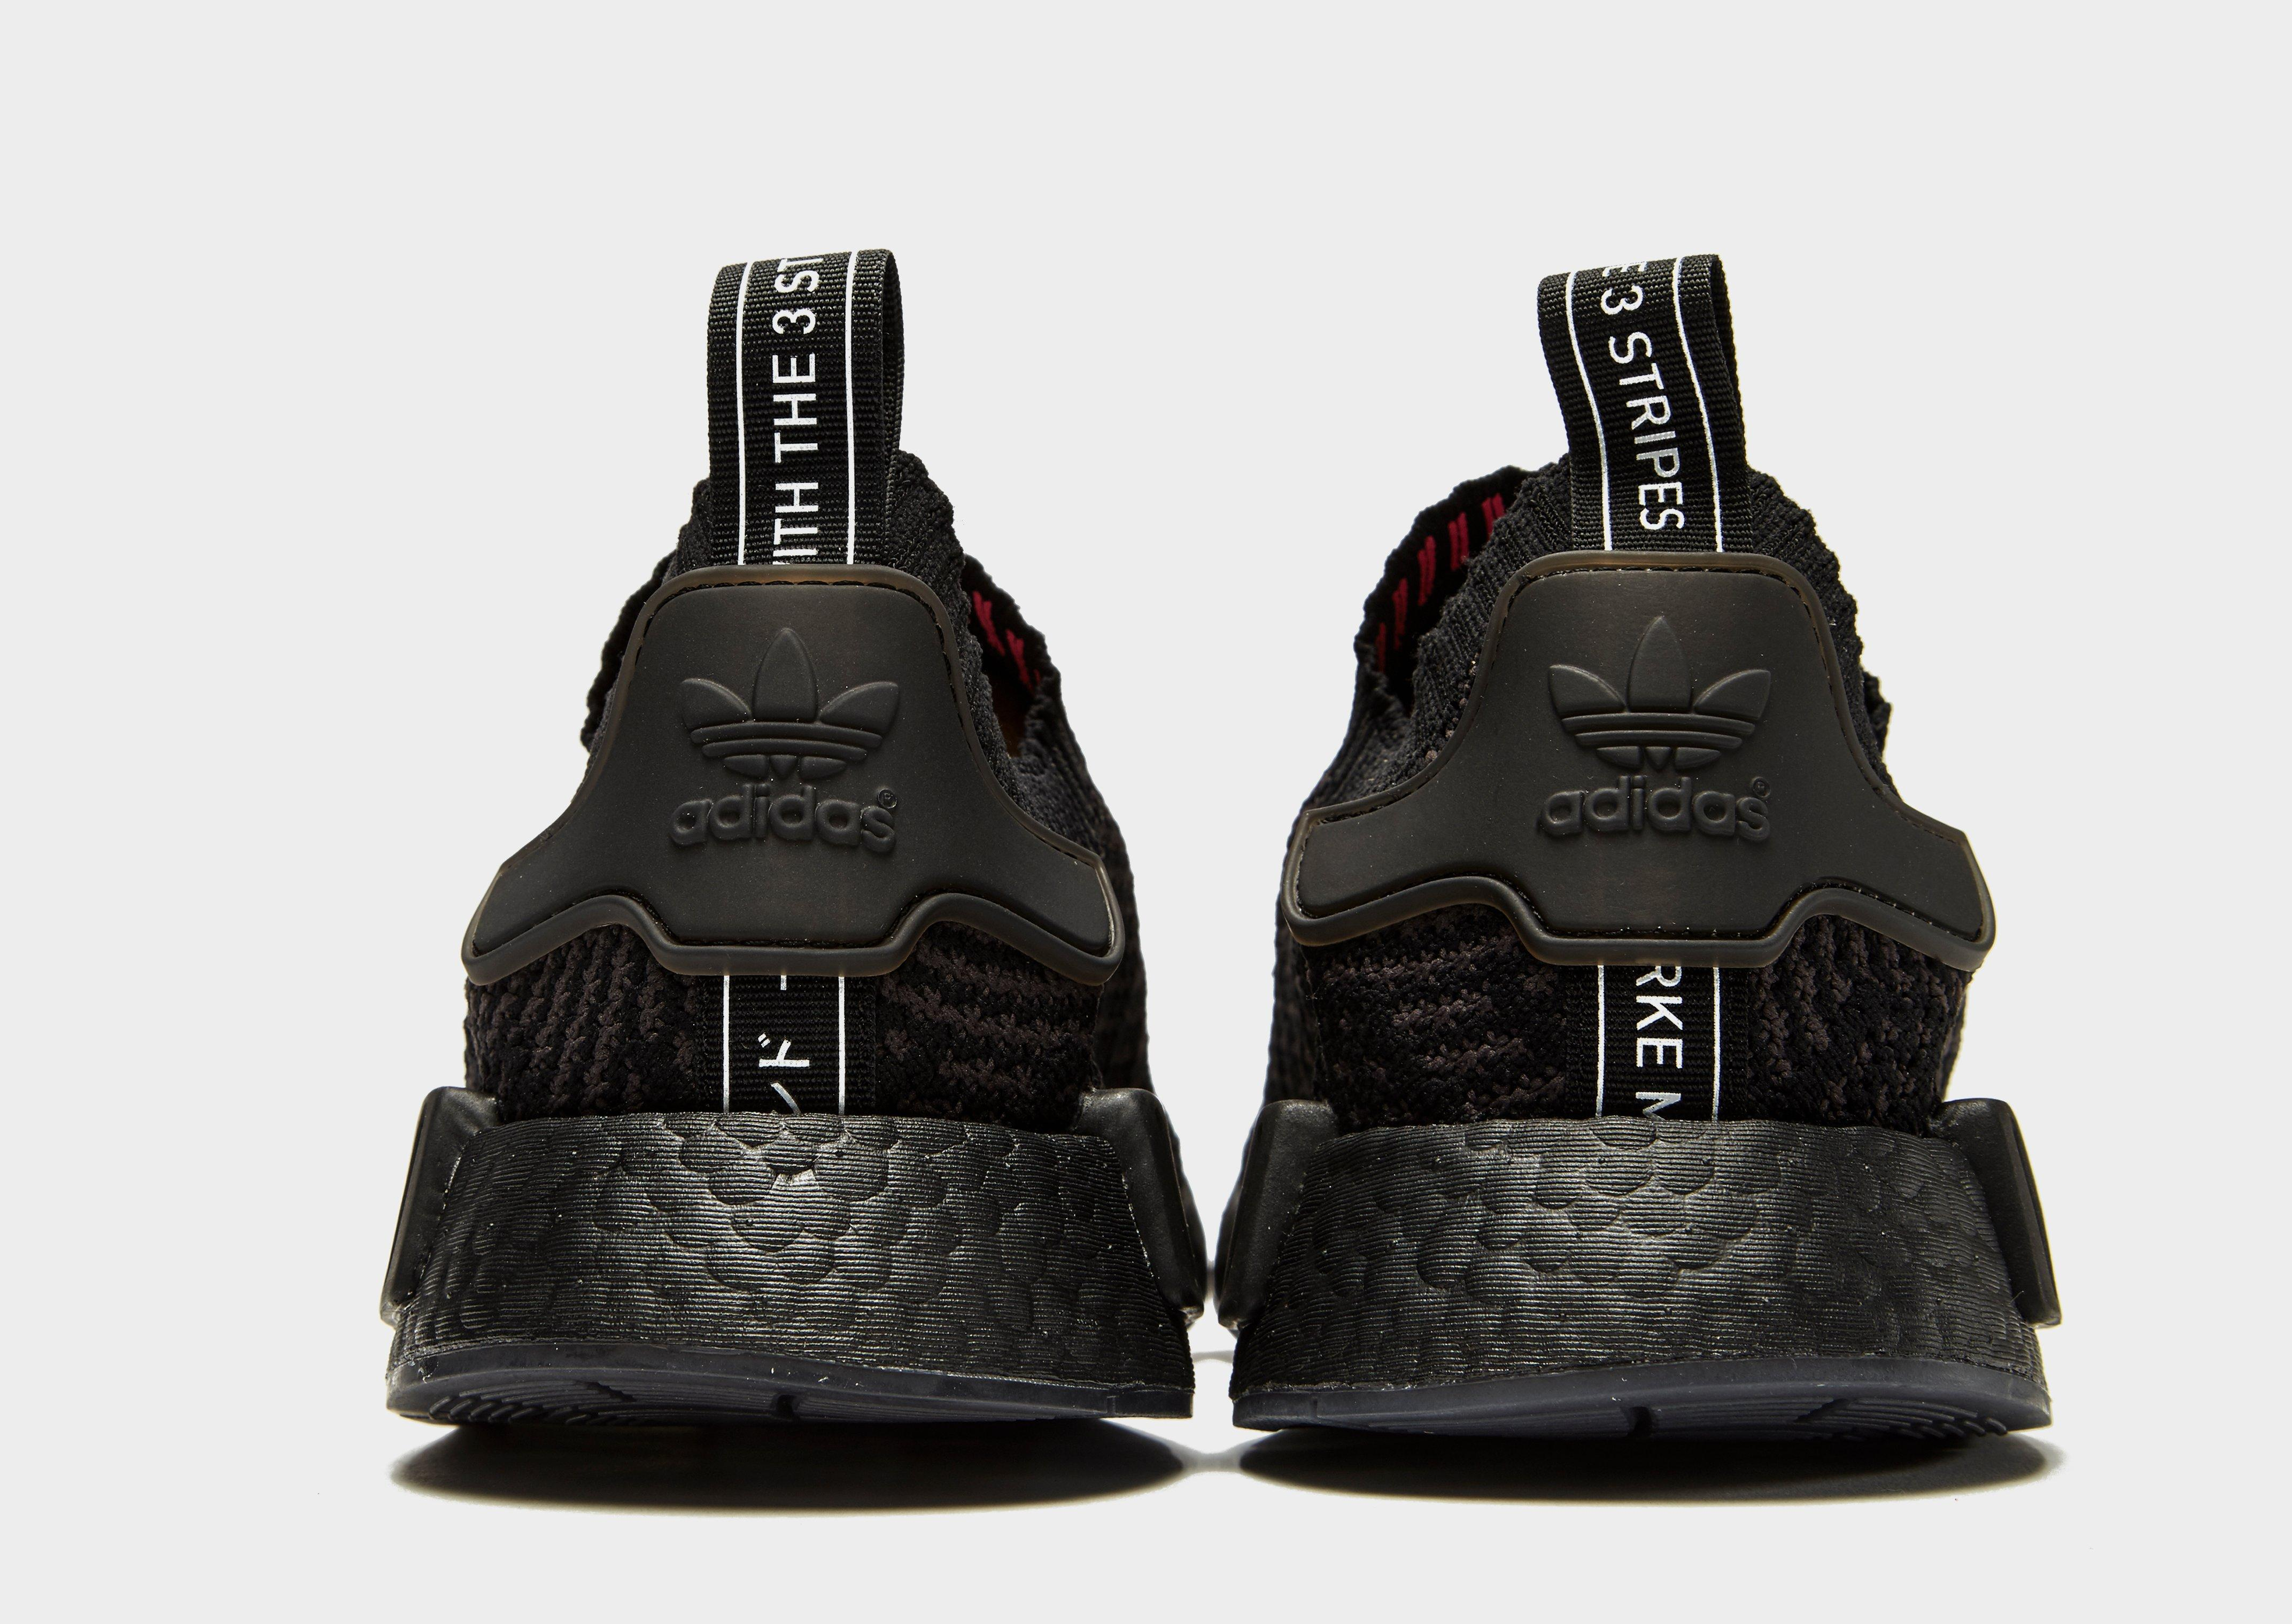 Lyst Adidas Originals Nmd R1 Stlt Primeknit In Black For Men